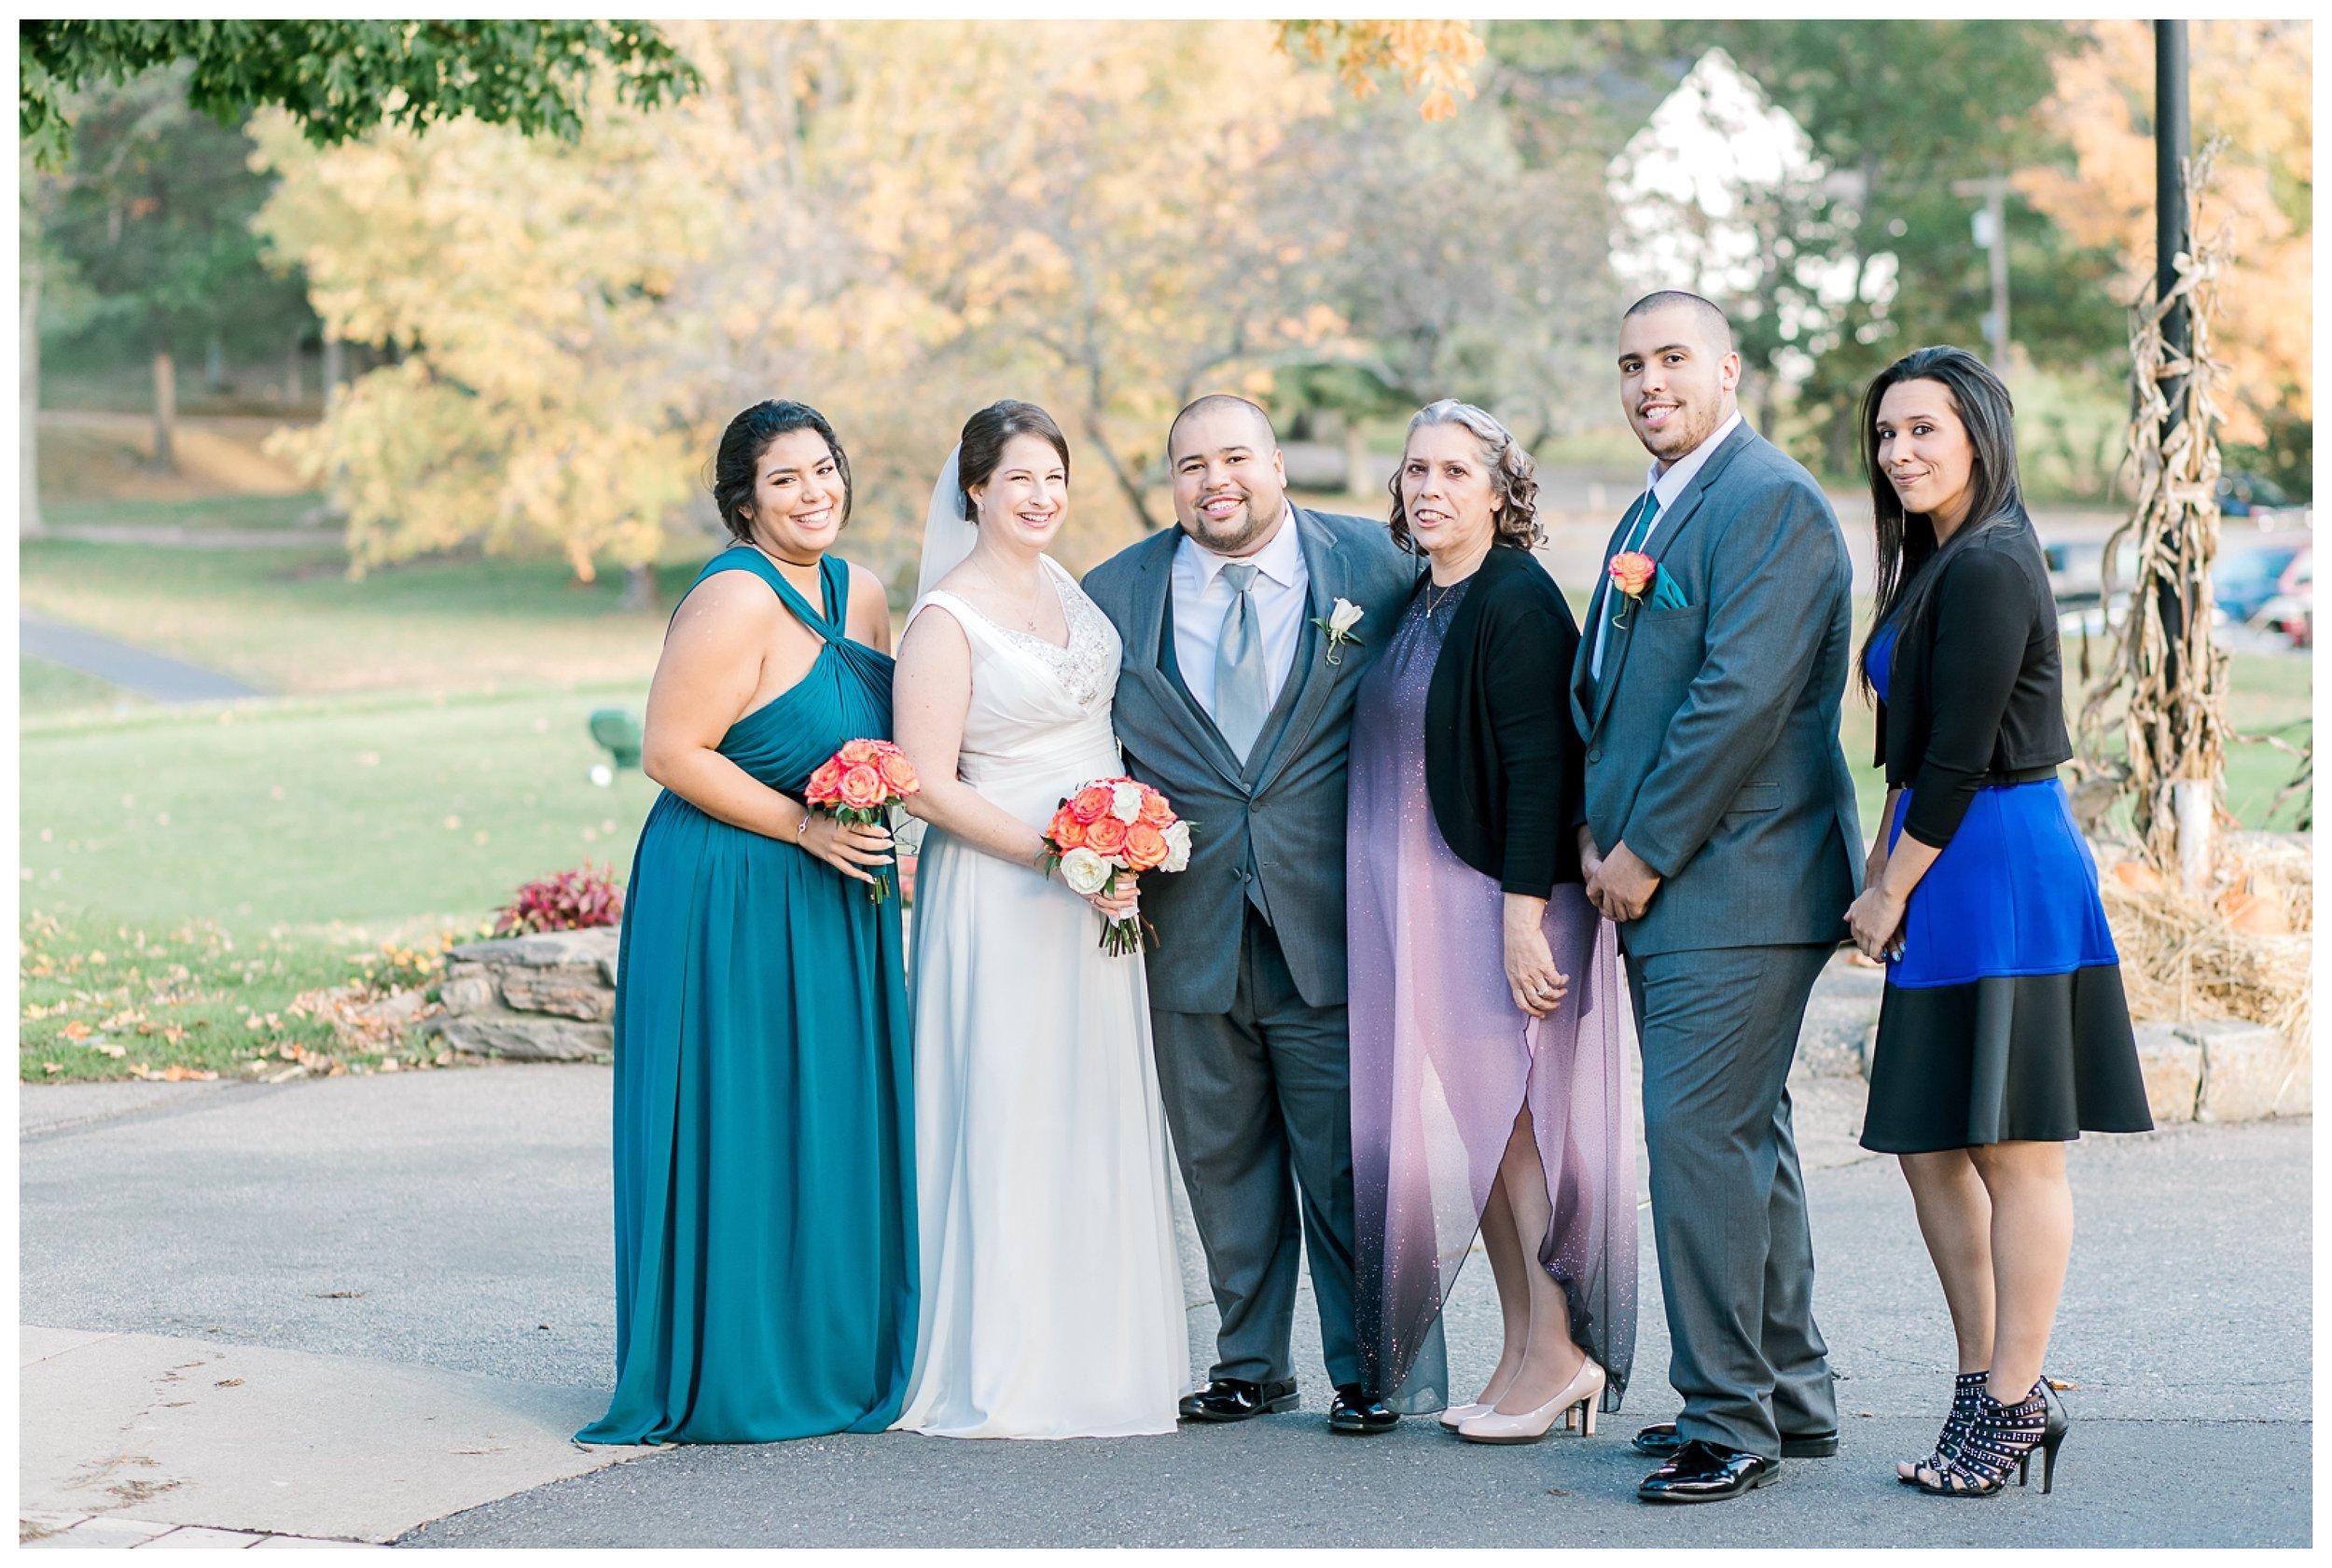 pleasant_valley_country_club_wedding_sutton_erica_pezente_photography (42).jpg